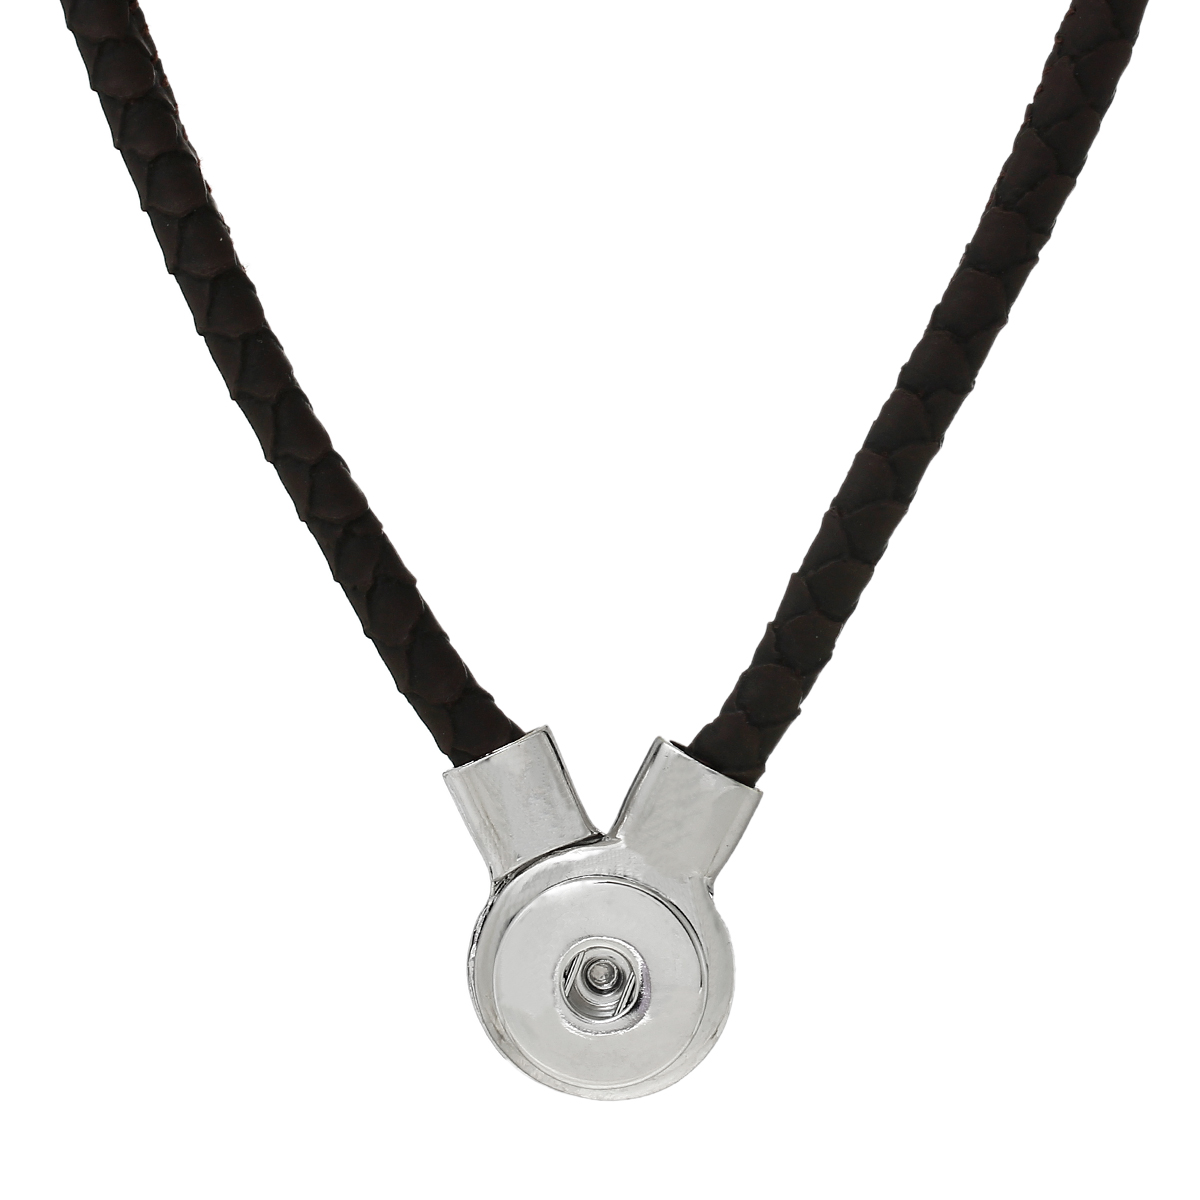 "8SEASONS PU Fashion Snap Jewelry Necklace Coffee Silver Tone 50cm x2.3cm(<font><b>19</b></font> 5/<font><b>8</b></font>"" <font><b>x</b></font> <font><b>7</b></font>/<font><b>8</b></font>""),Snap Charm Hole Size: 6mm,<font><b>1</b></font> PC"